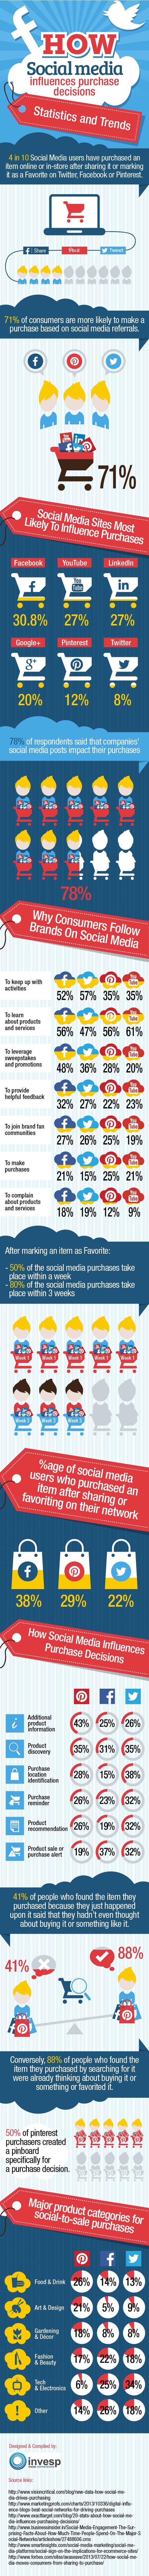 infografia compras redes sociales influencia